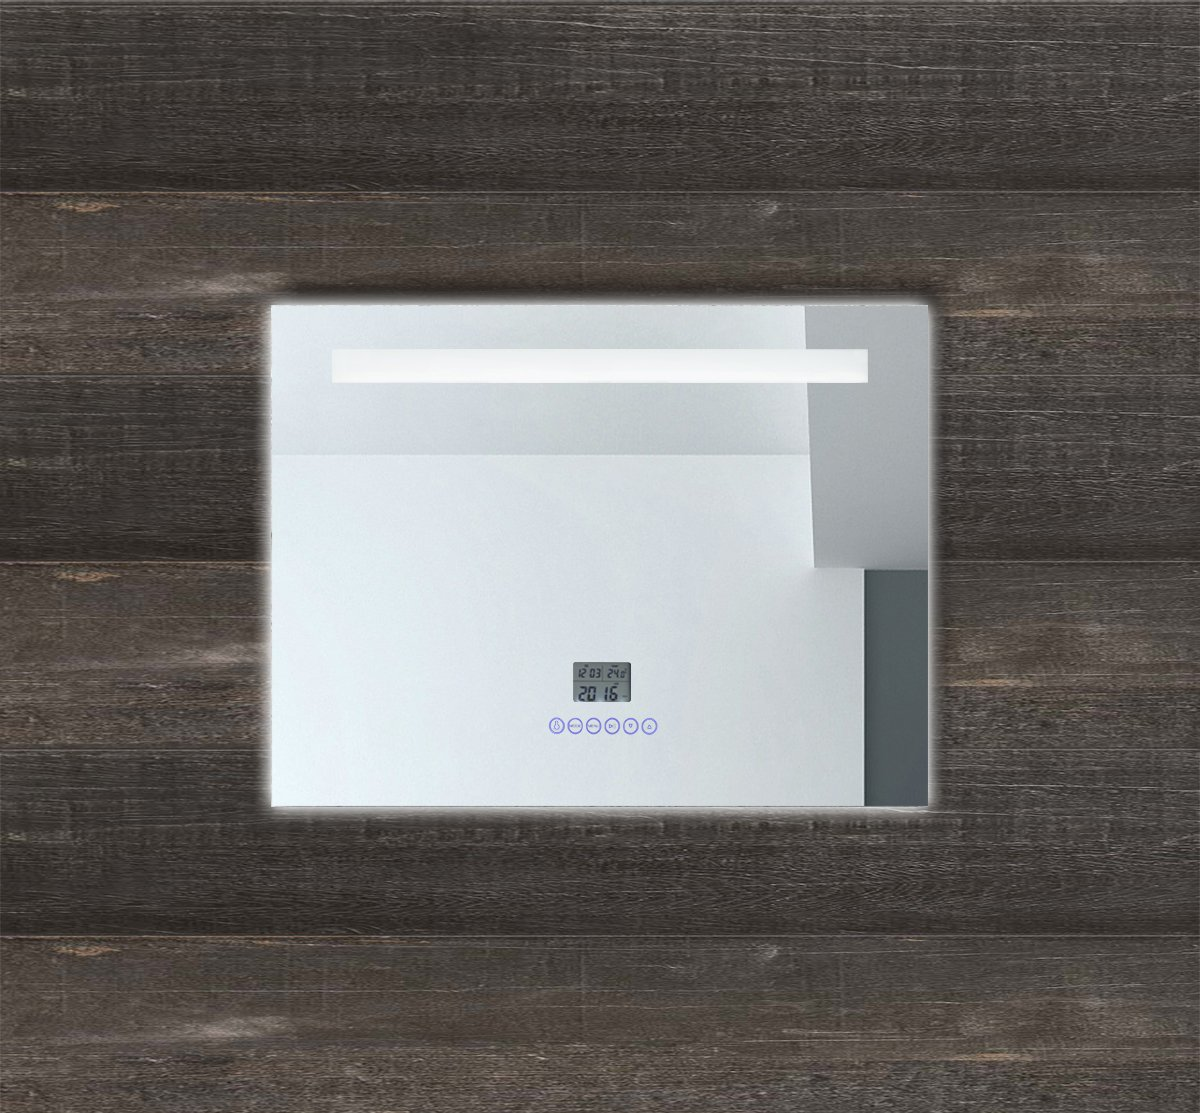 LED Multimedia Badspiegel mit Beleuchtung Touch Uhr Radio MP3 USB ...